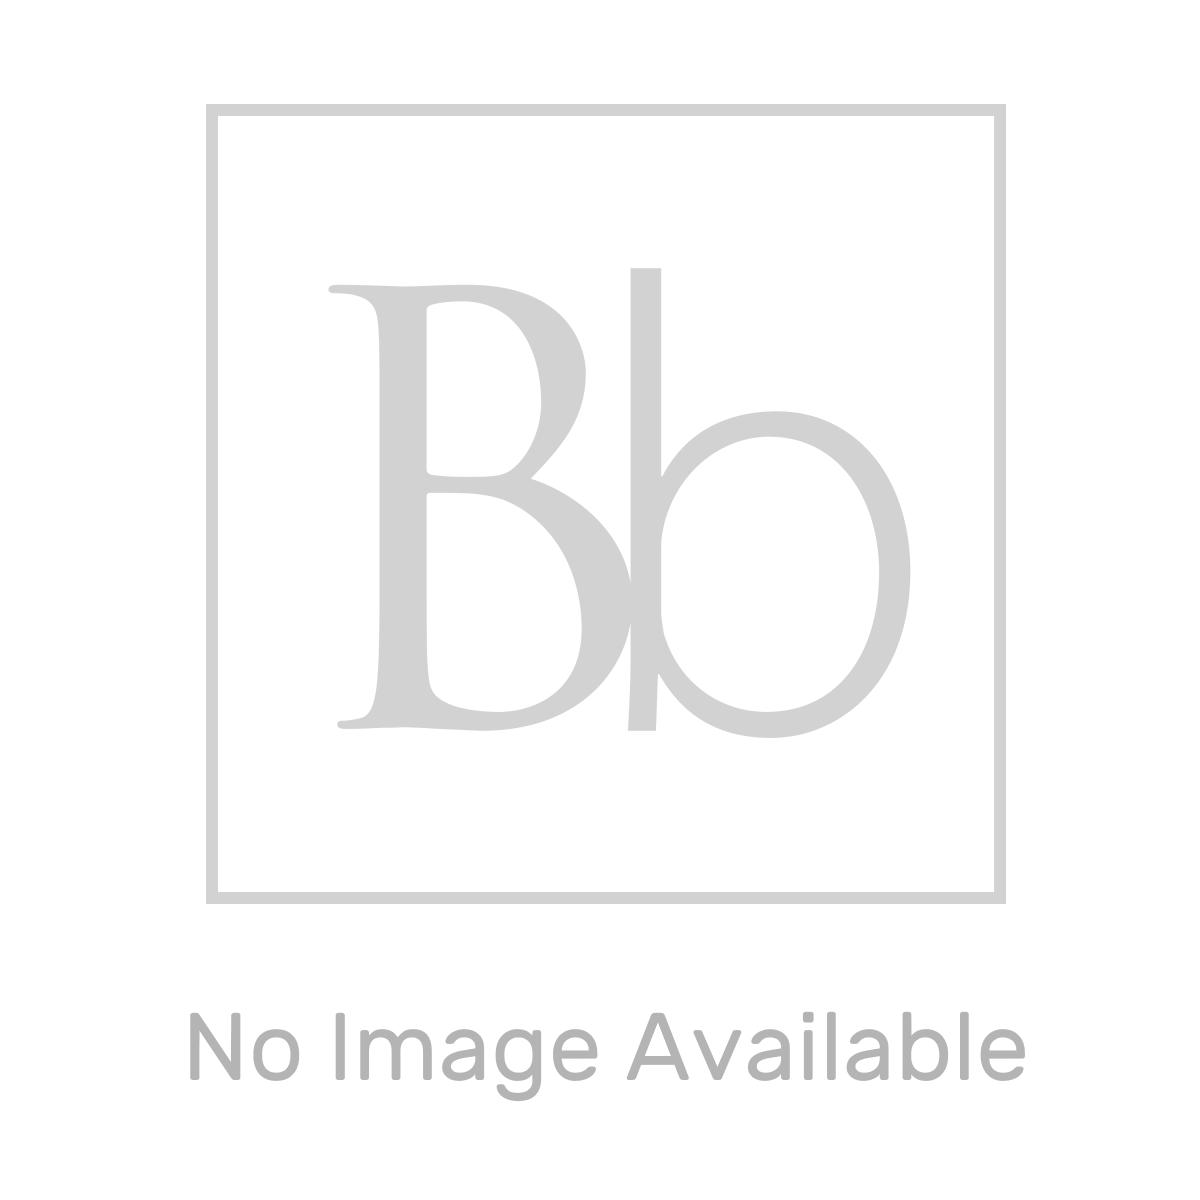 RAK Moon Black Toilet Roll Holder Measurements